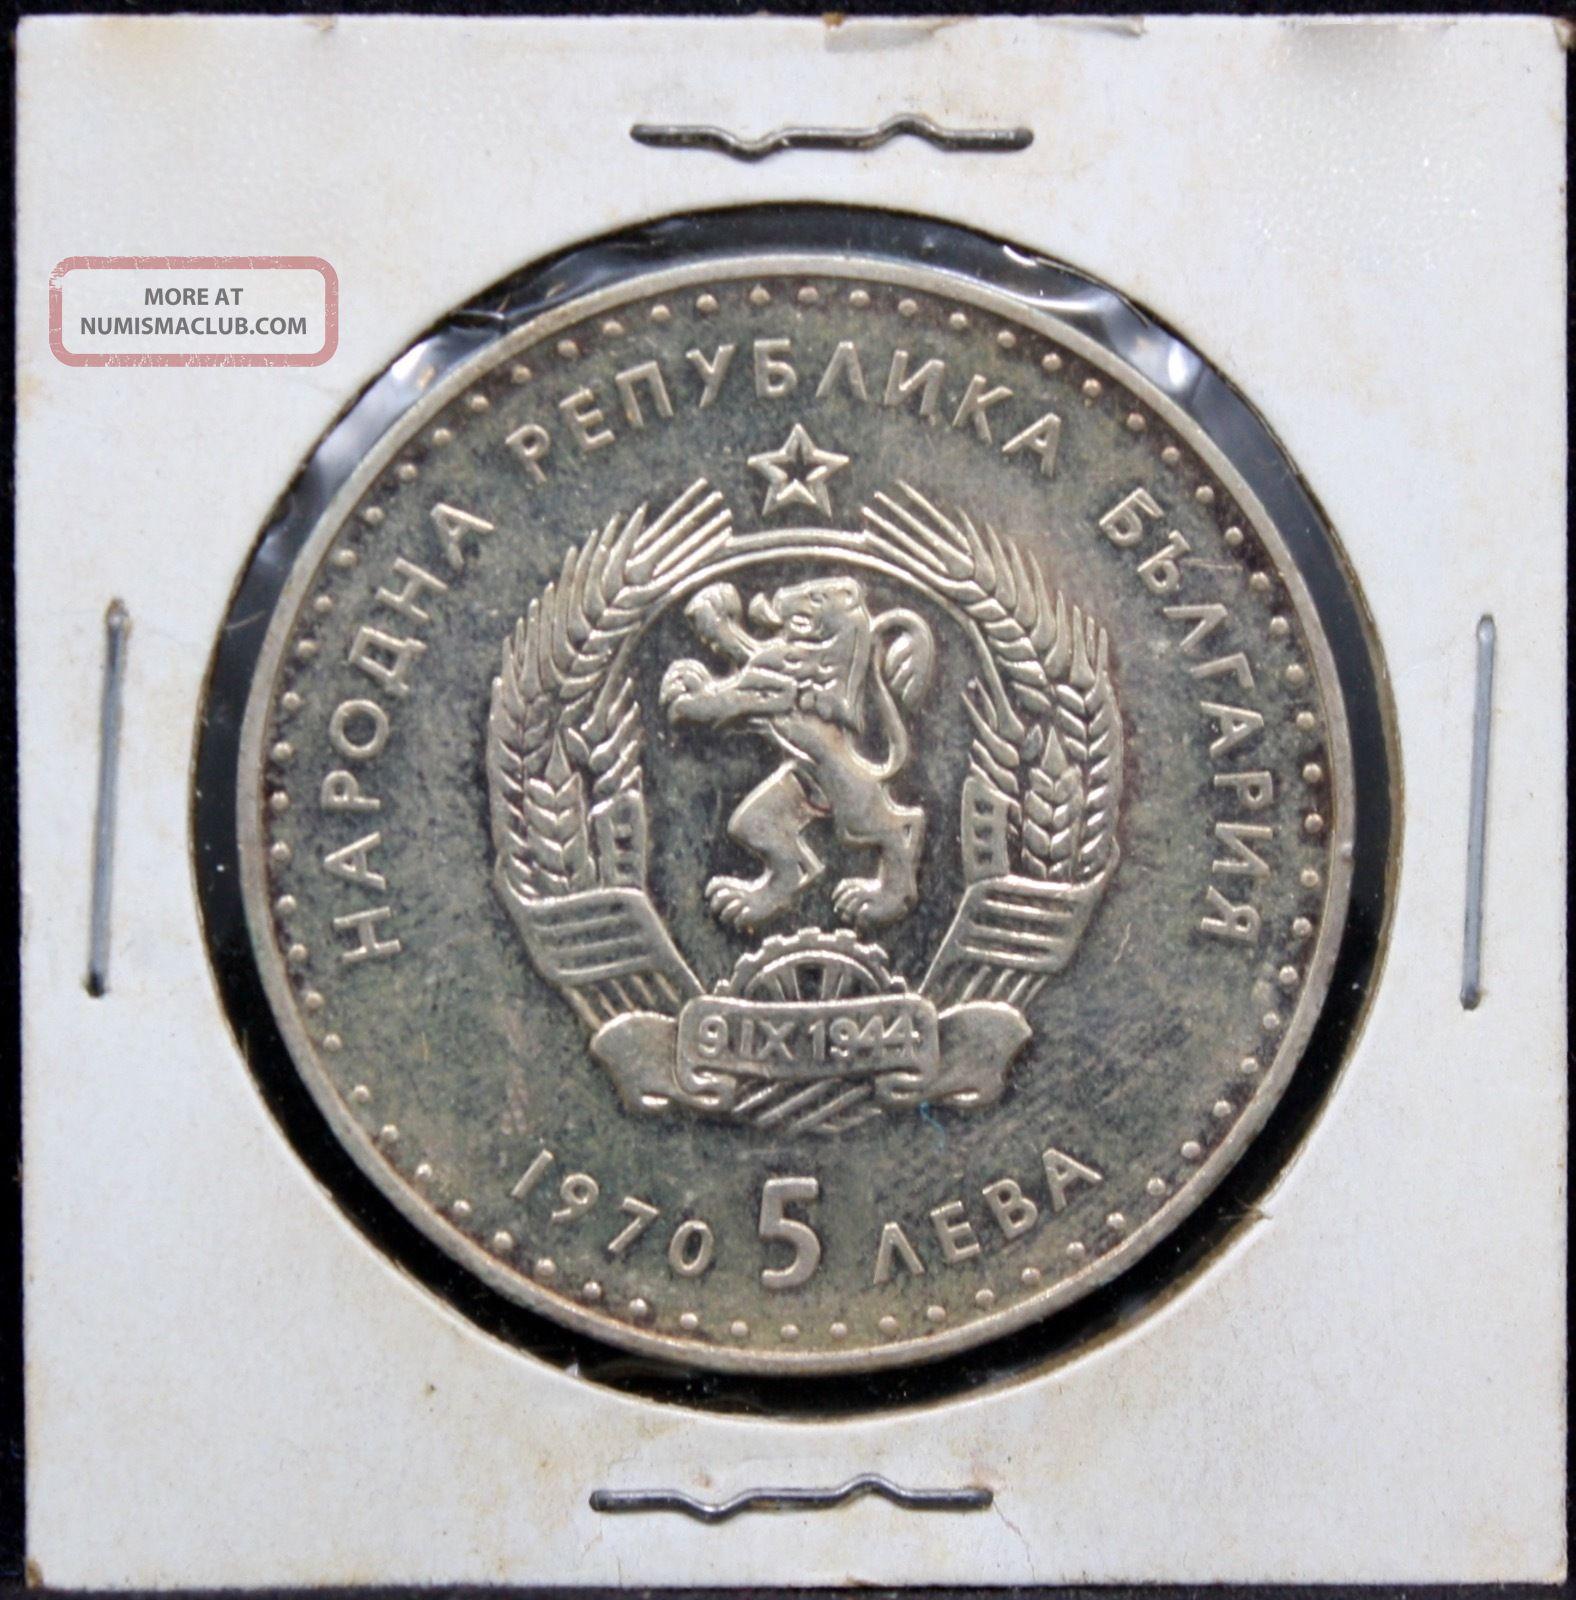 Bulgaria 1970 Coin 5 Leva Km 78 Europe photo